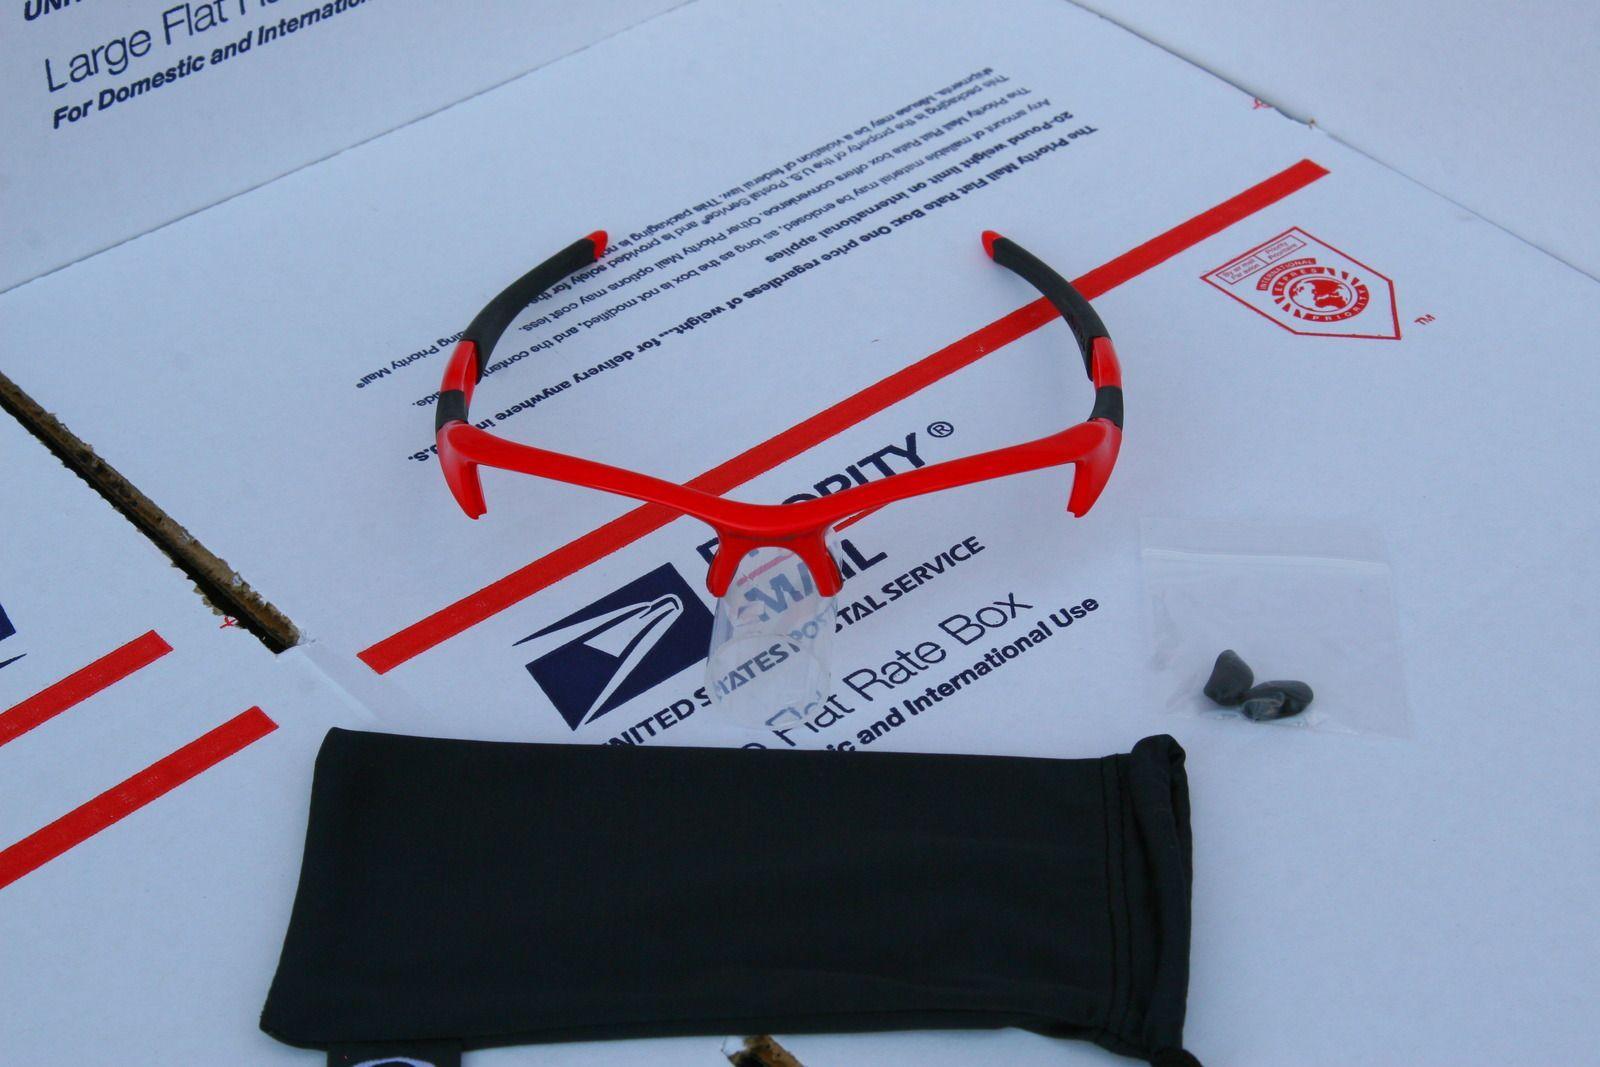 Oakley Flak Jacket Infrared Frame 03-896 And Jade Iridium XLJ Lenses - d2t2.jpg